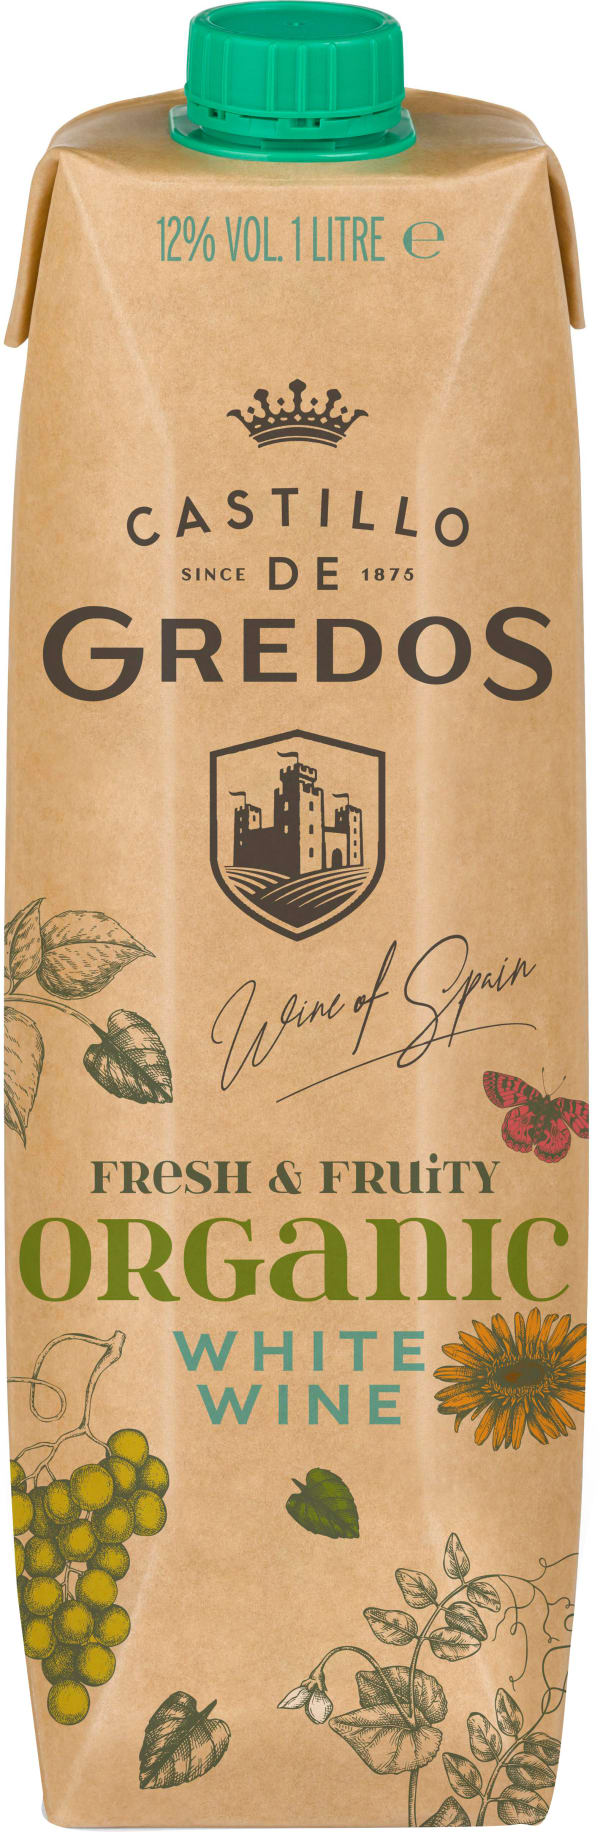 Castillo de Gredos Blanco Organic carton package